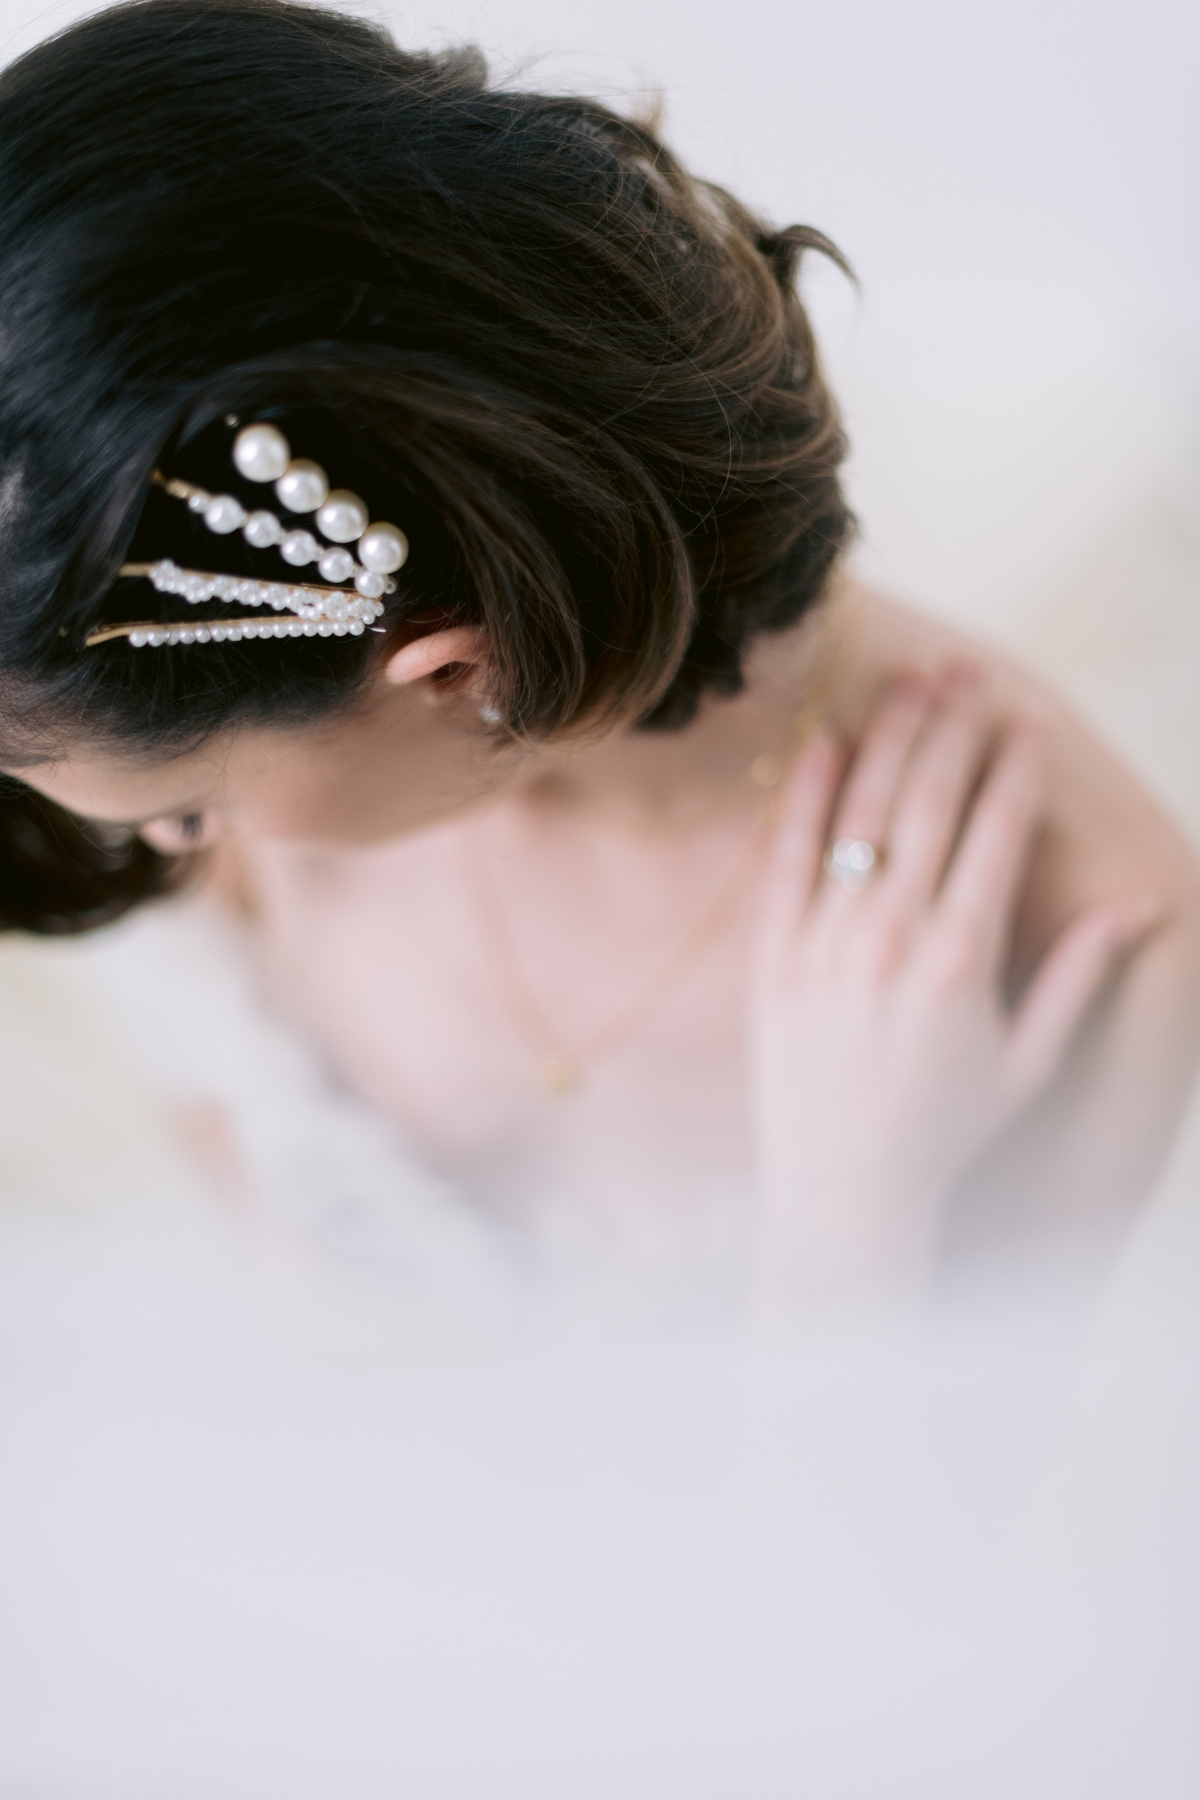 Laura Lanzerotte Bridal Danielle Heinson Photography 41